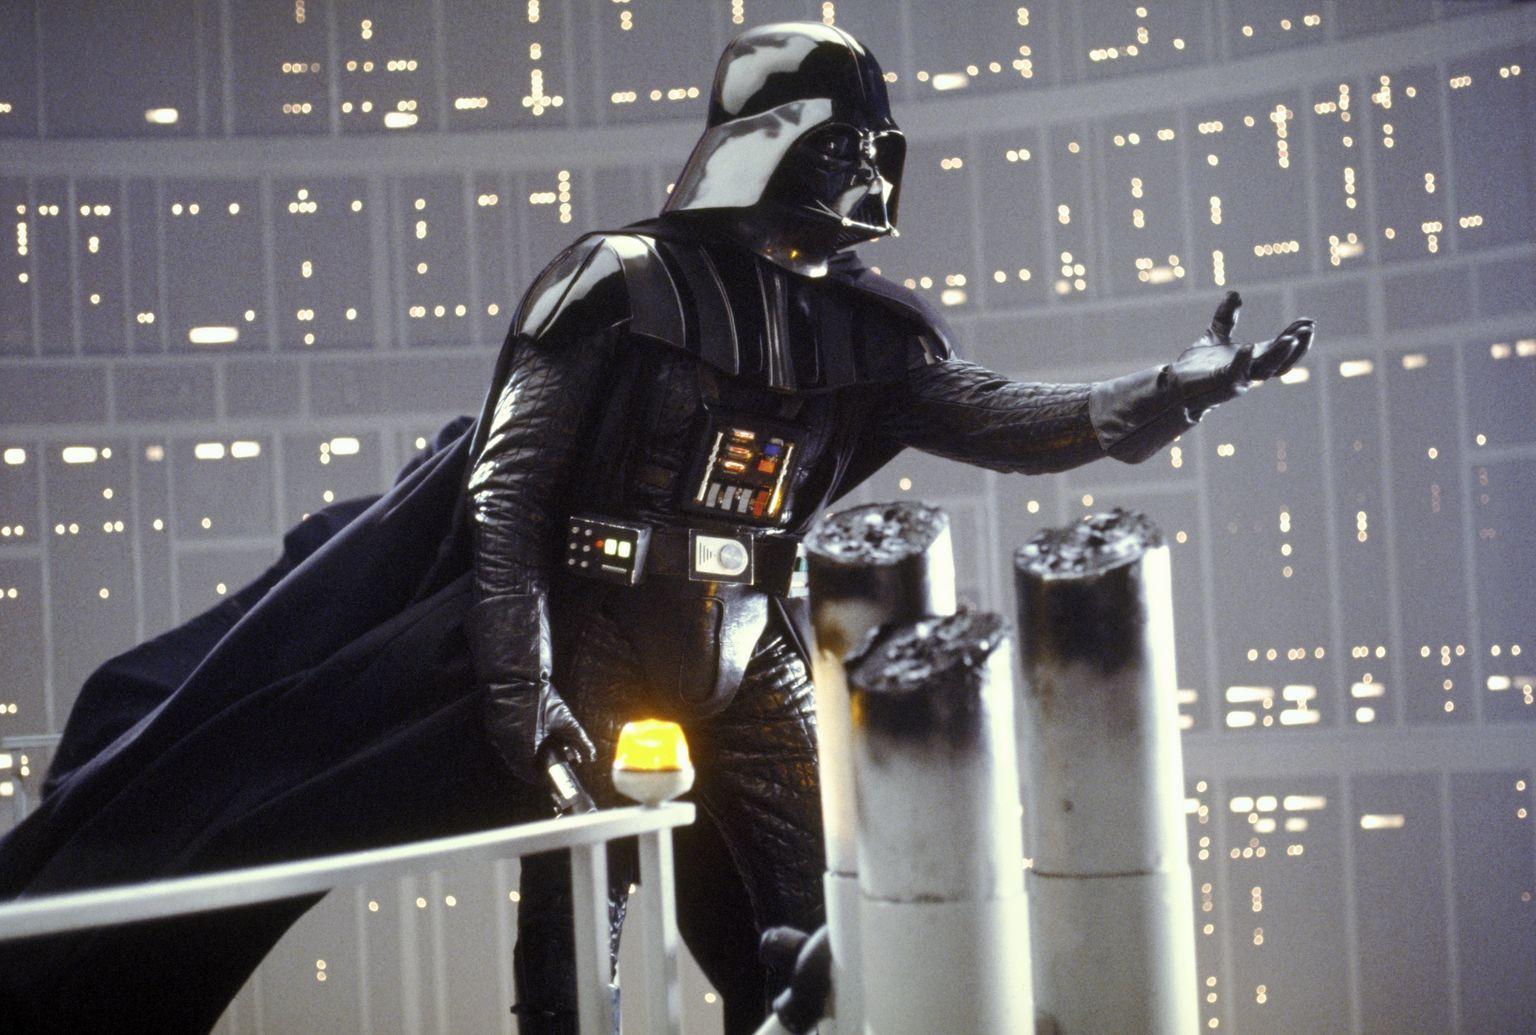 Episode V: The Empire Strikes Back (1980)